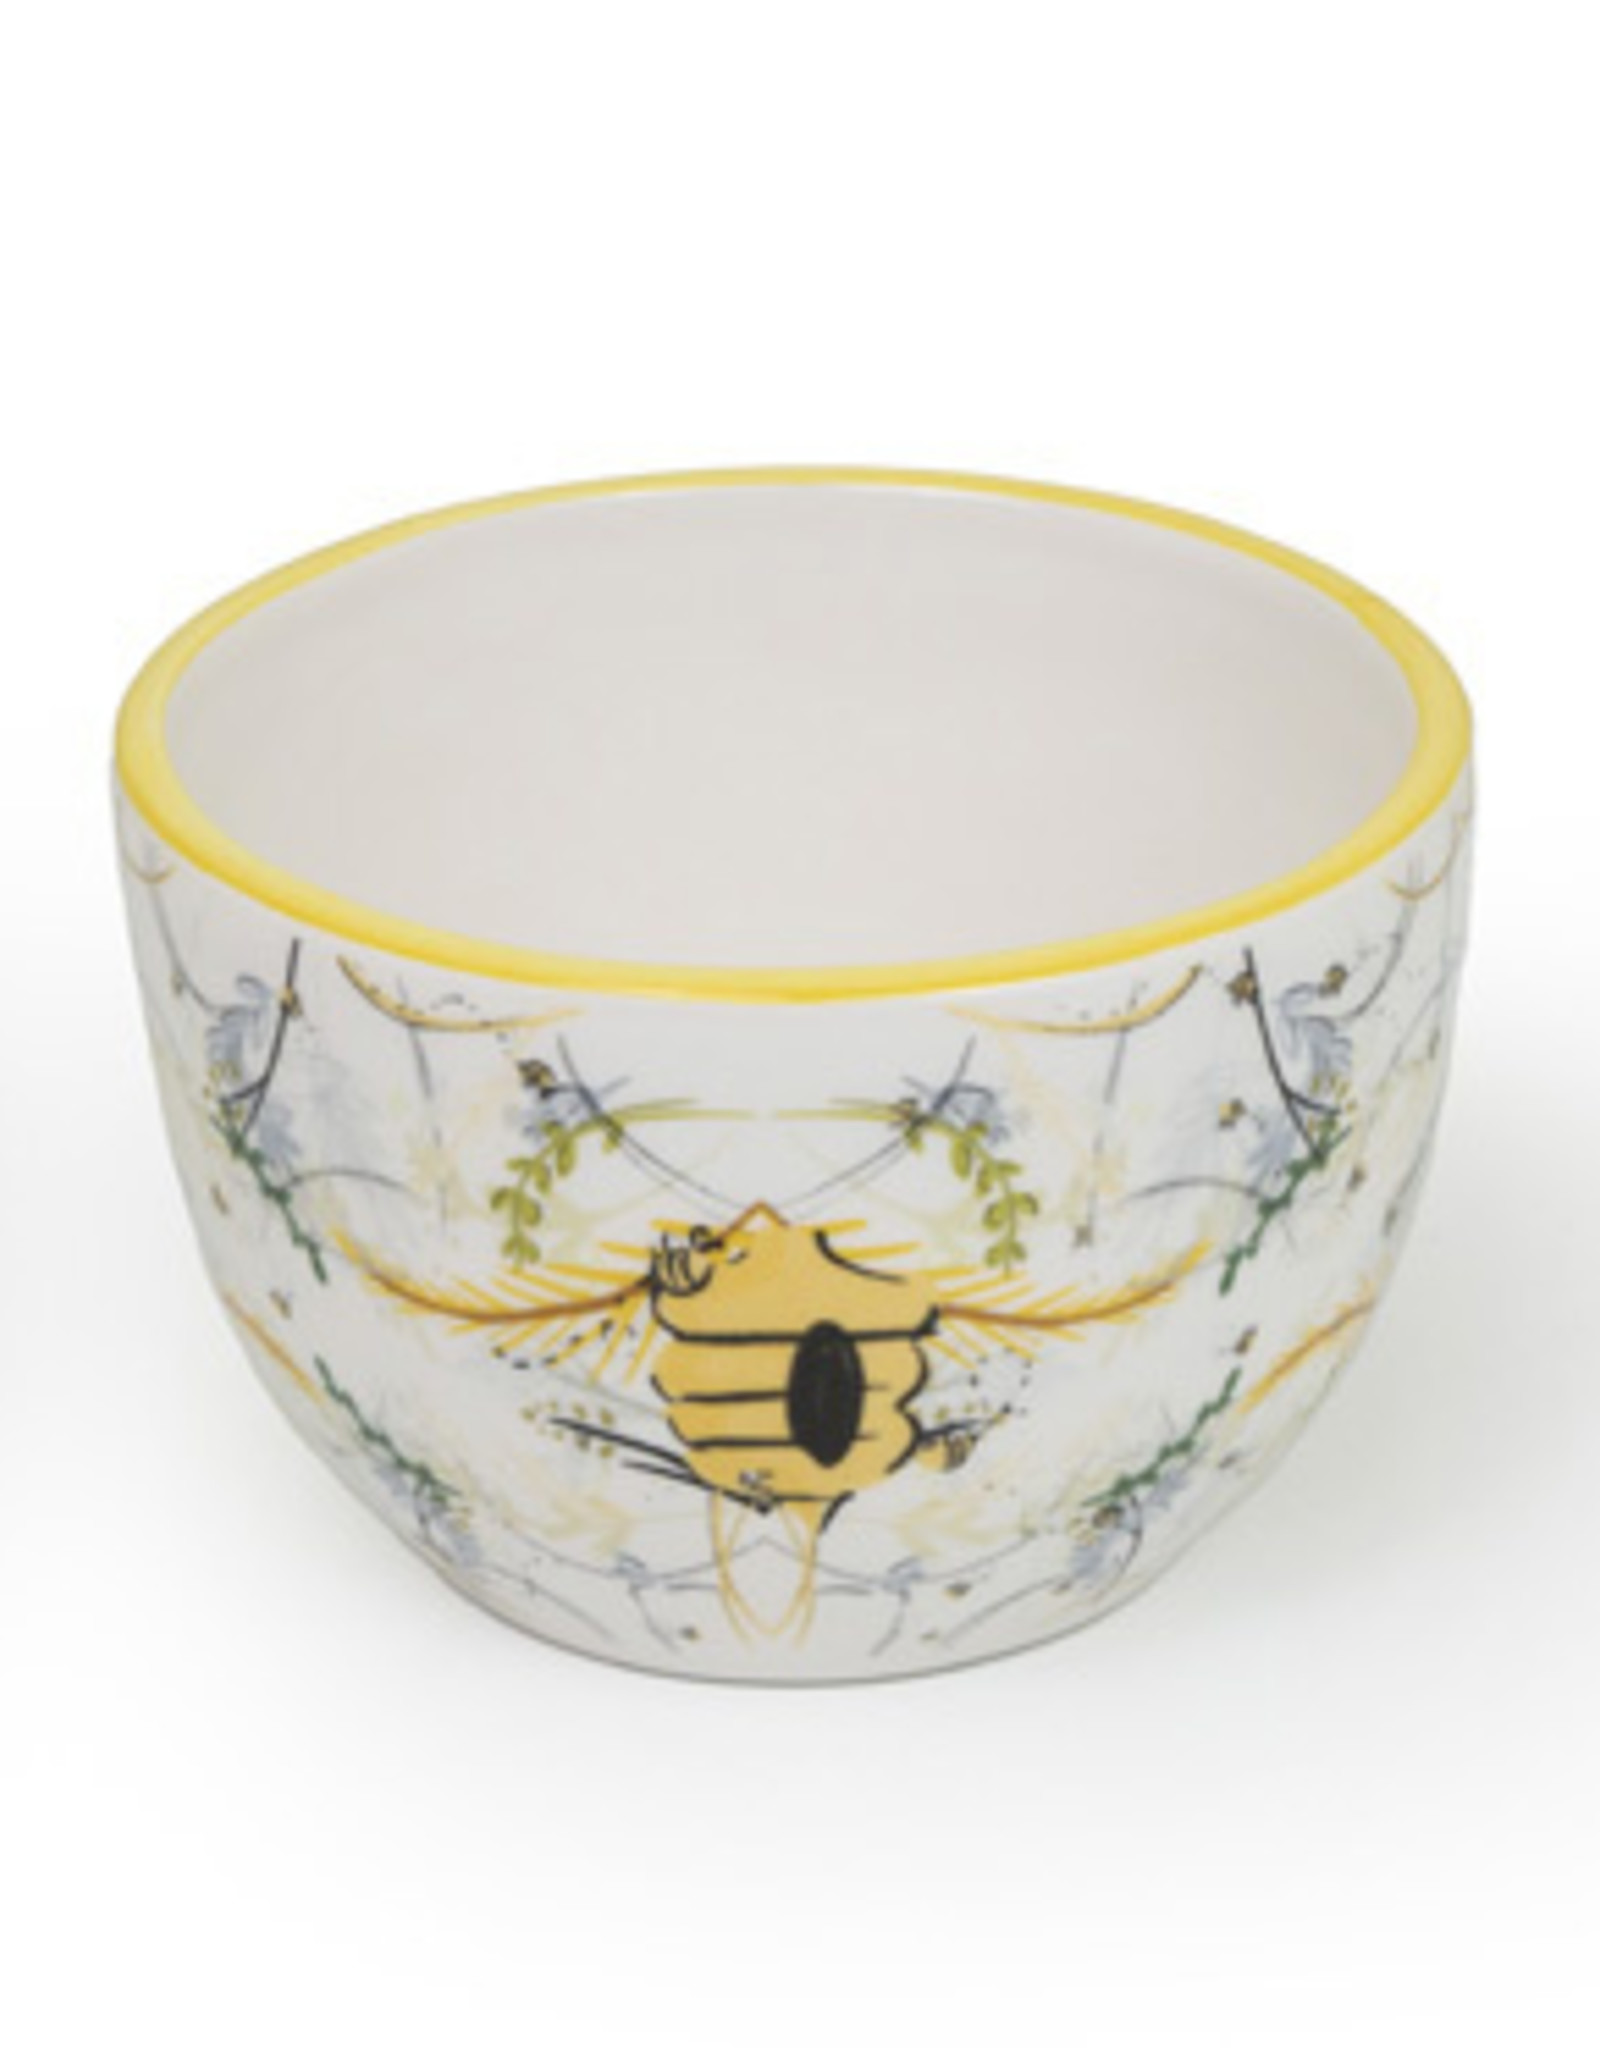 Boston International Bee Haven Bowls, Set of 3